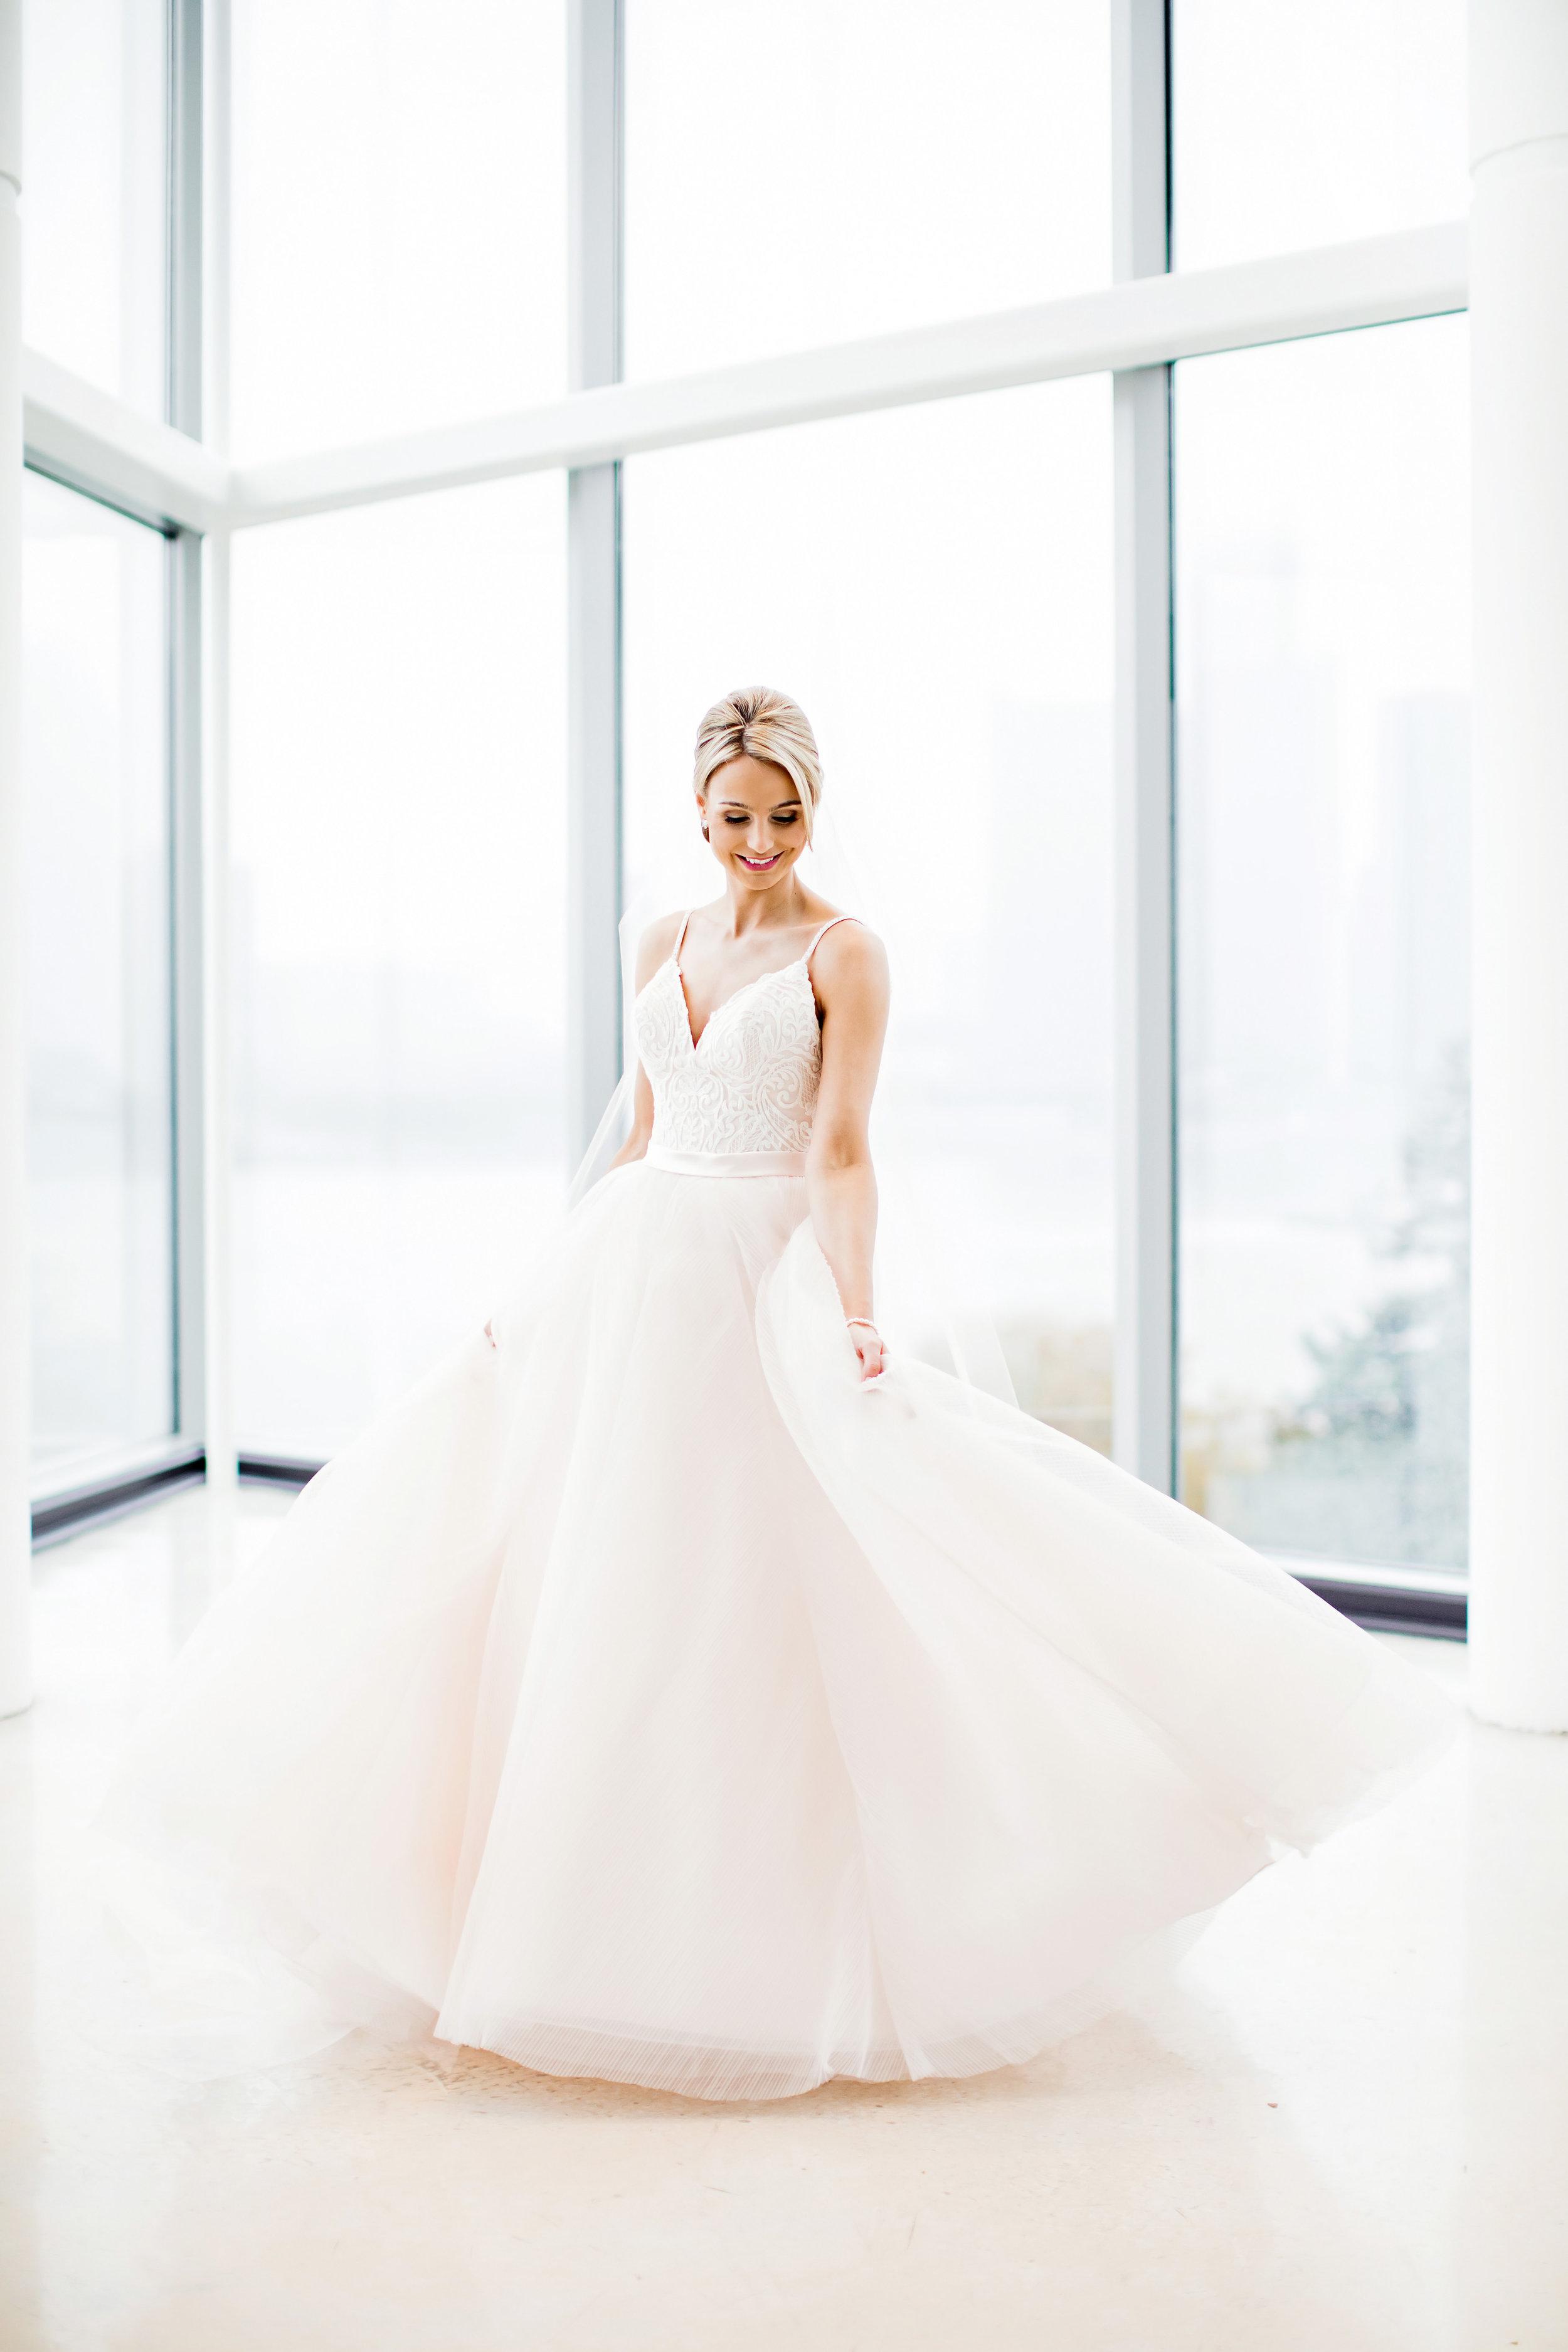 windsor-toronto-ontario-wedding-photographer-eryn-shea-photography-05.JPG